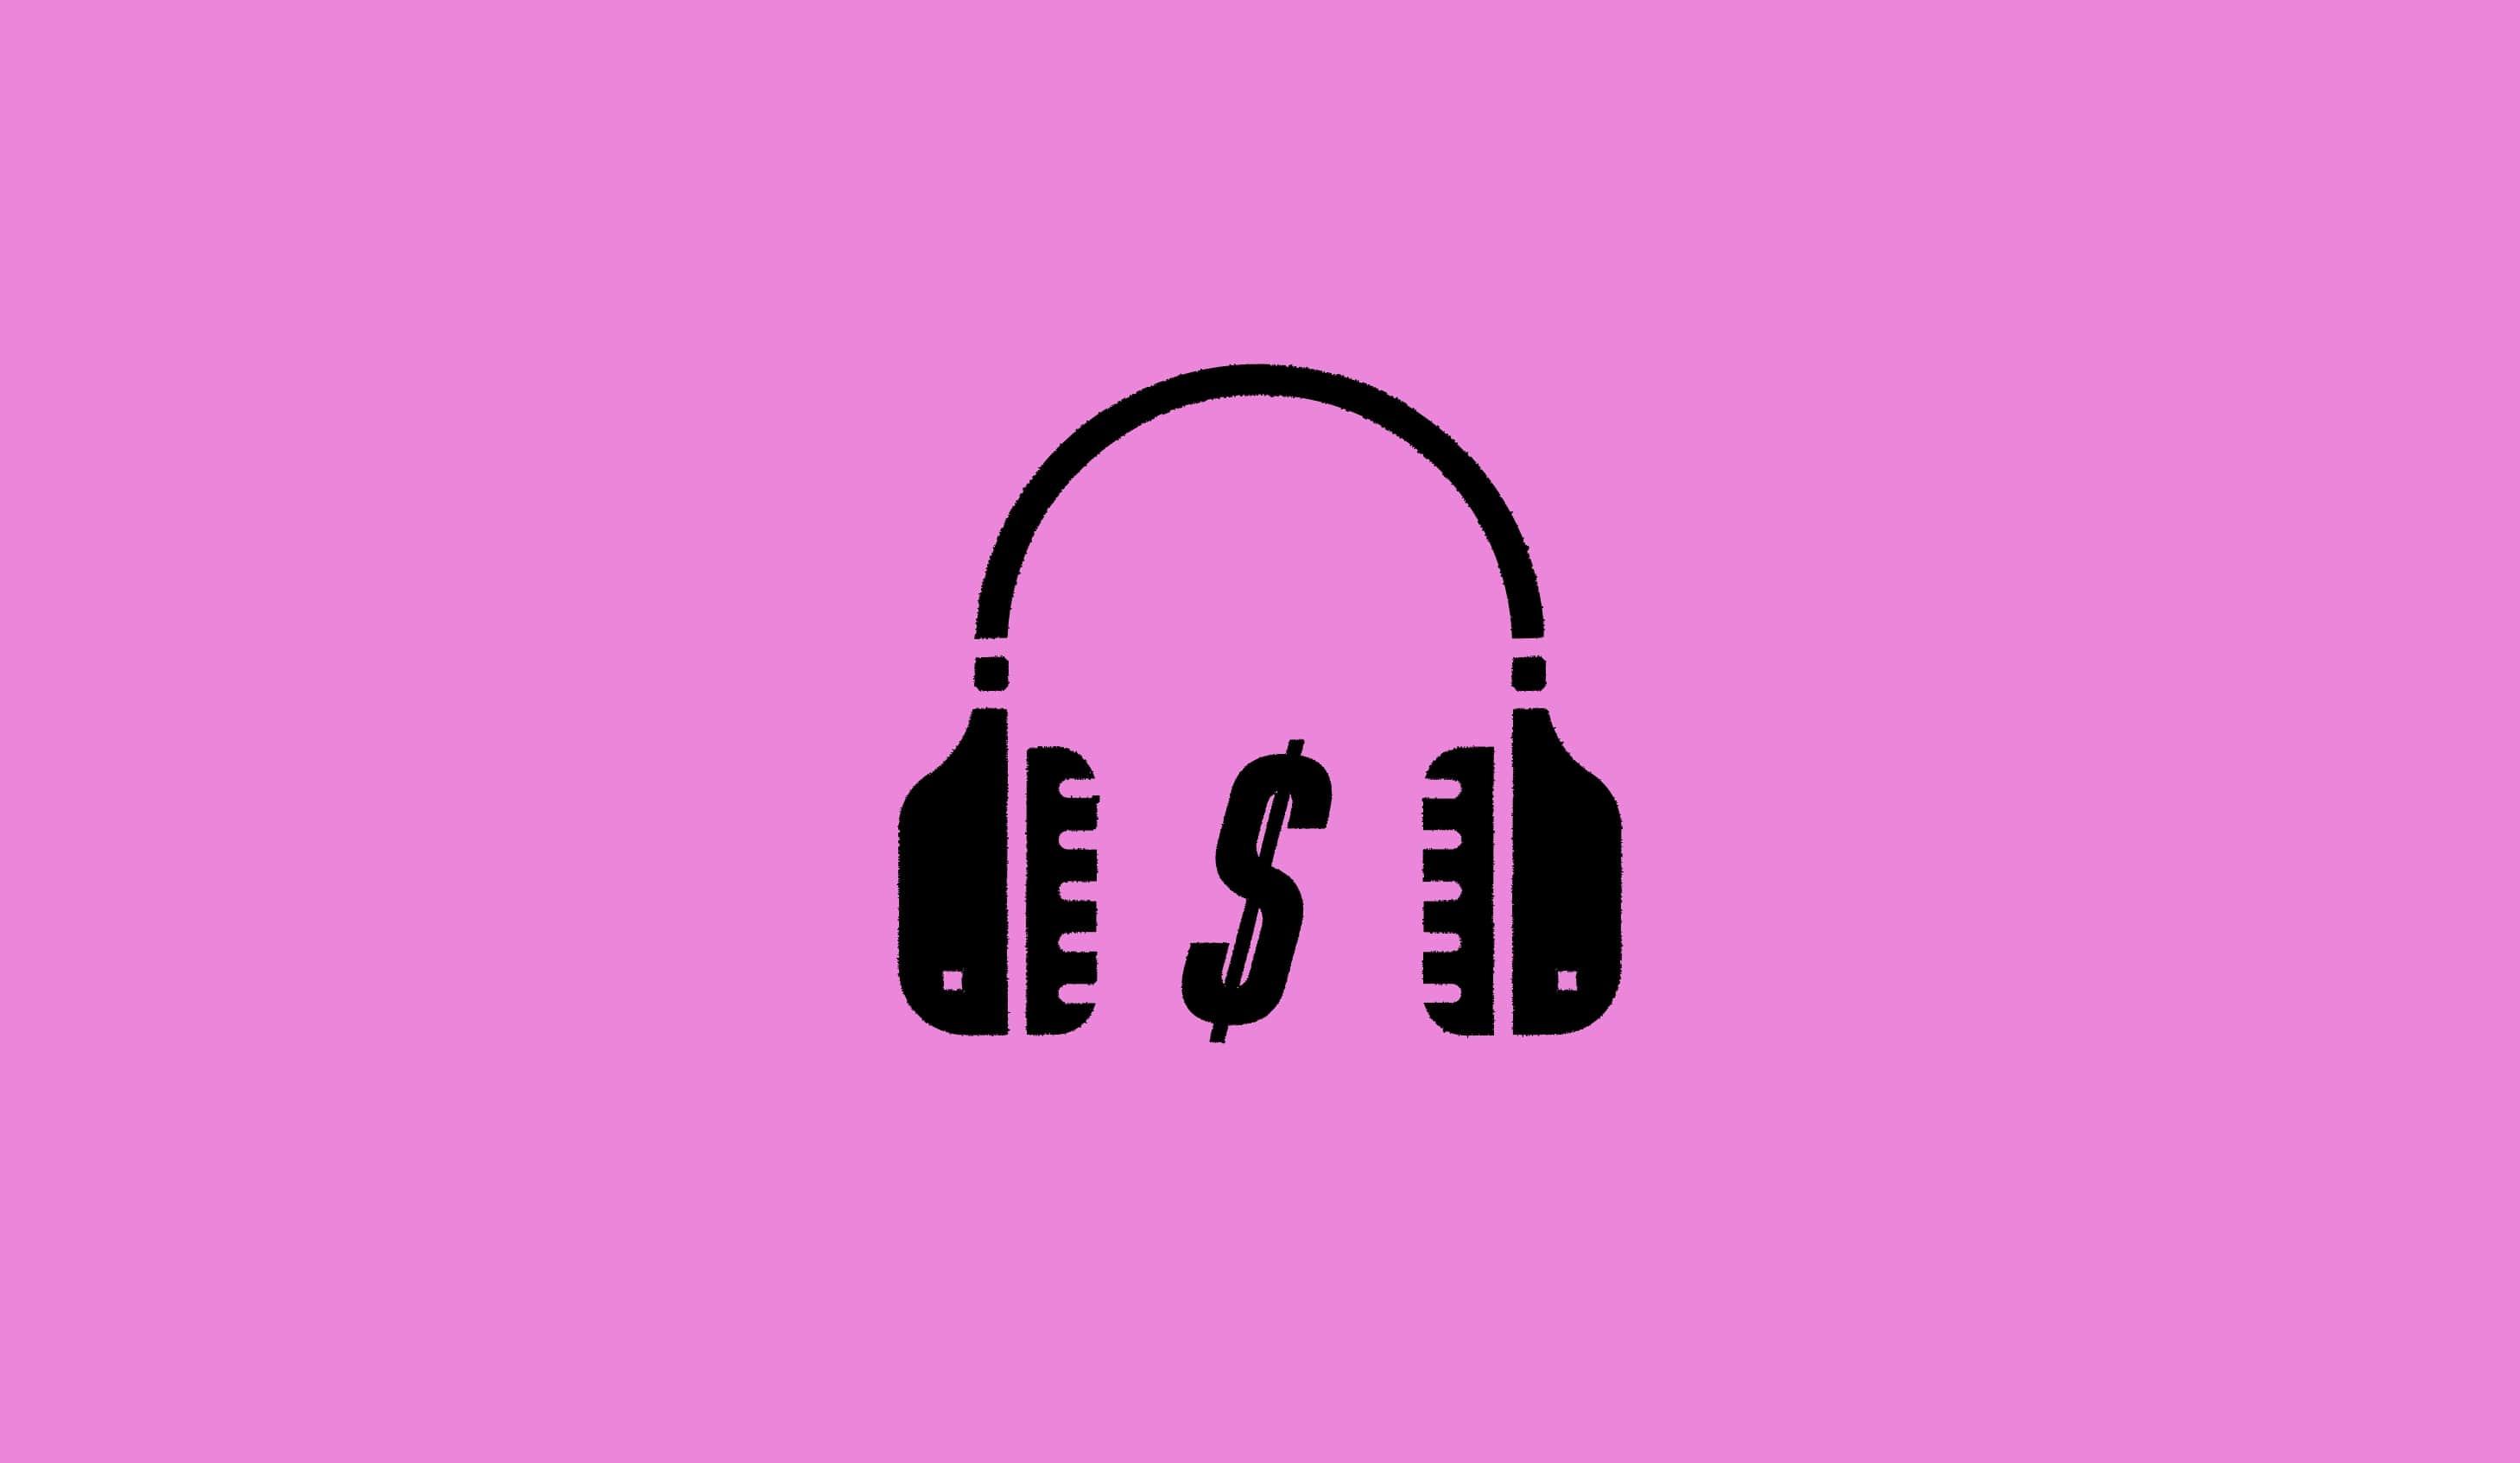 headphone artwork